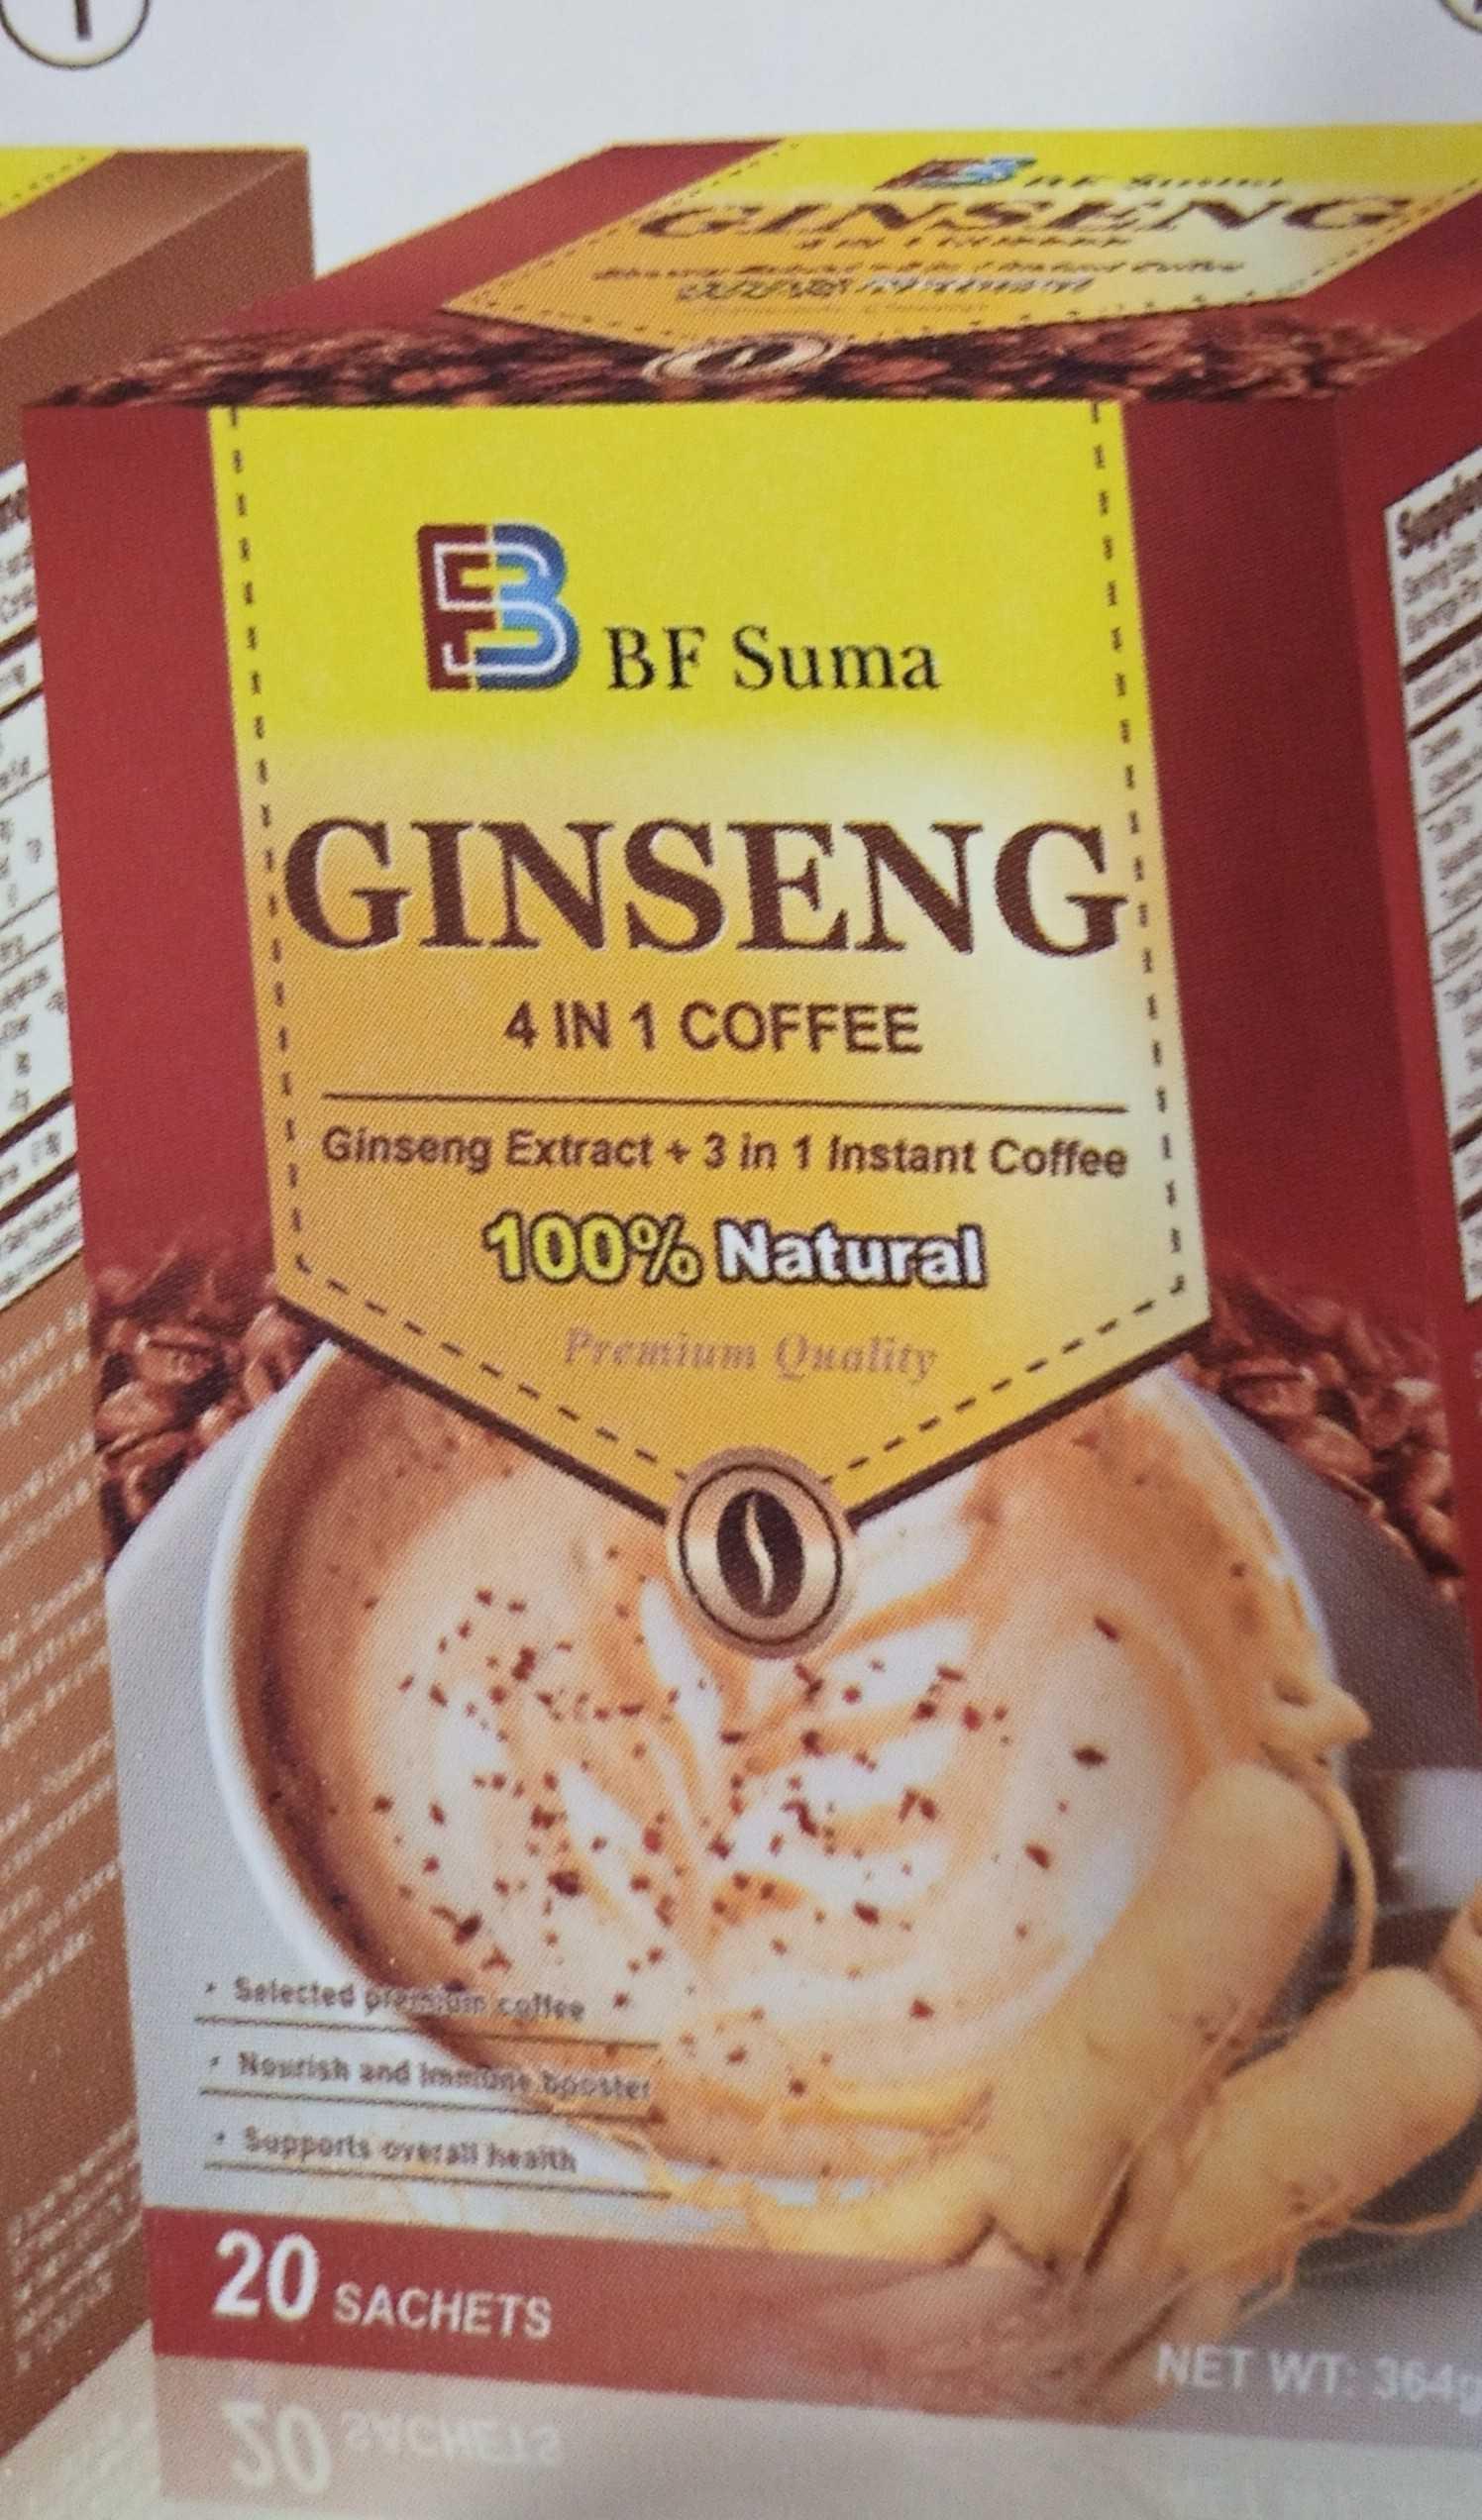 Bf suma 4 in 1 ginseng coffee